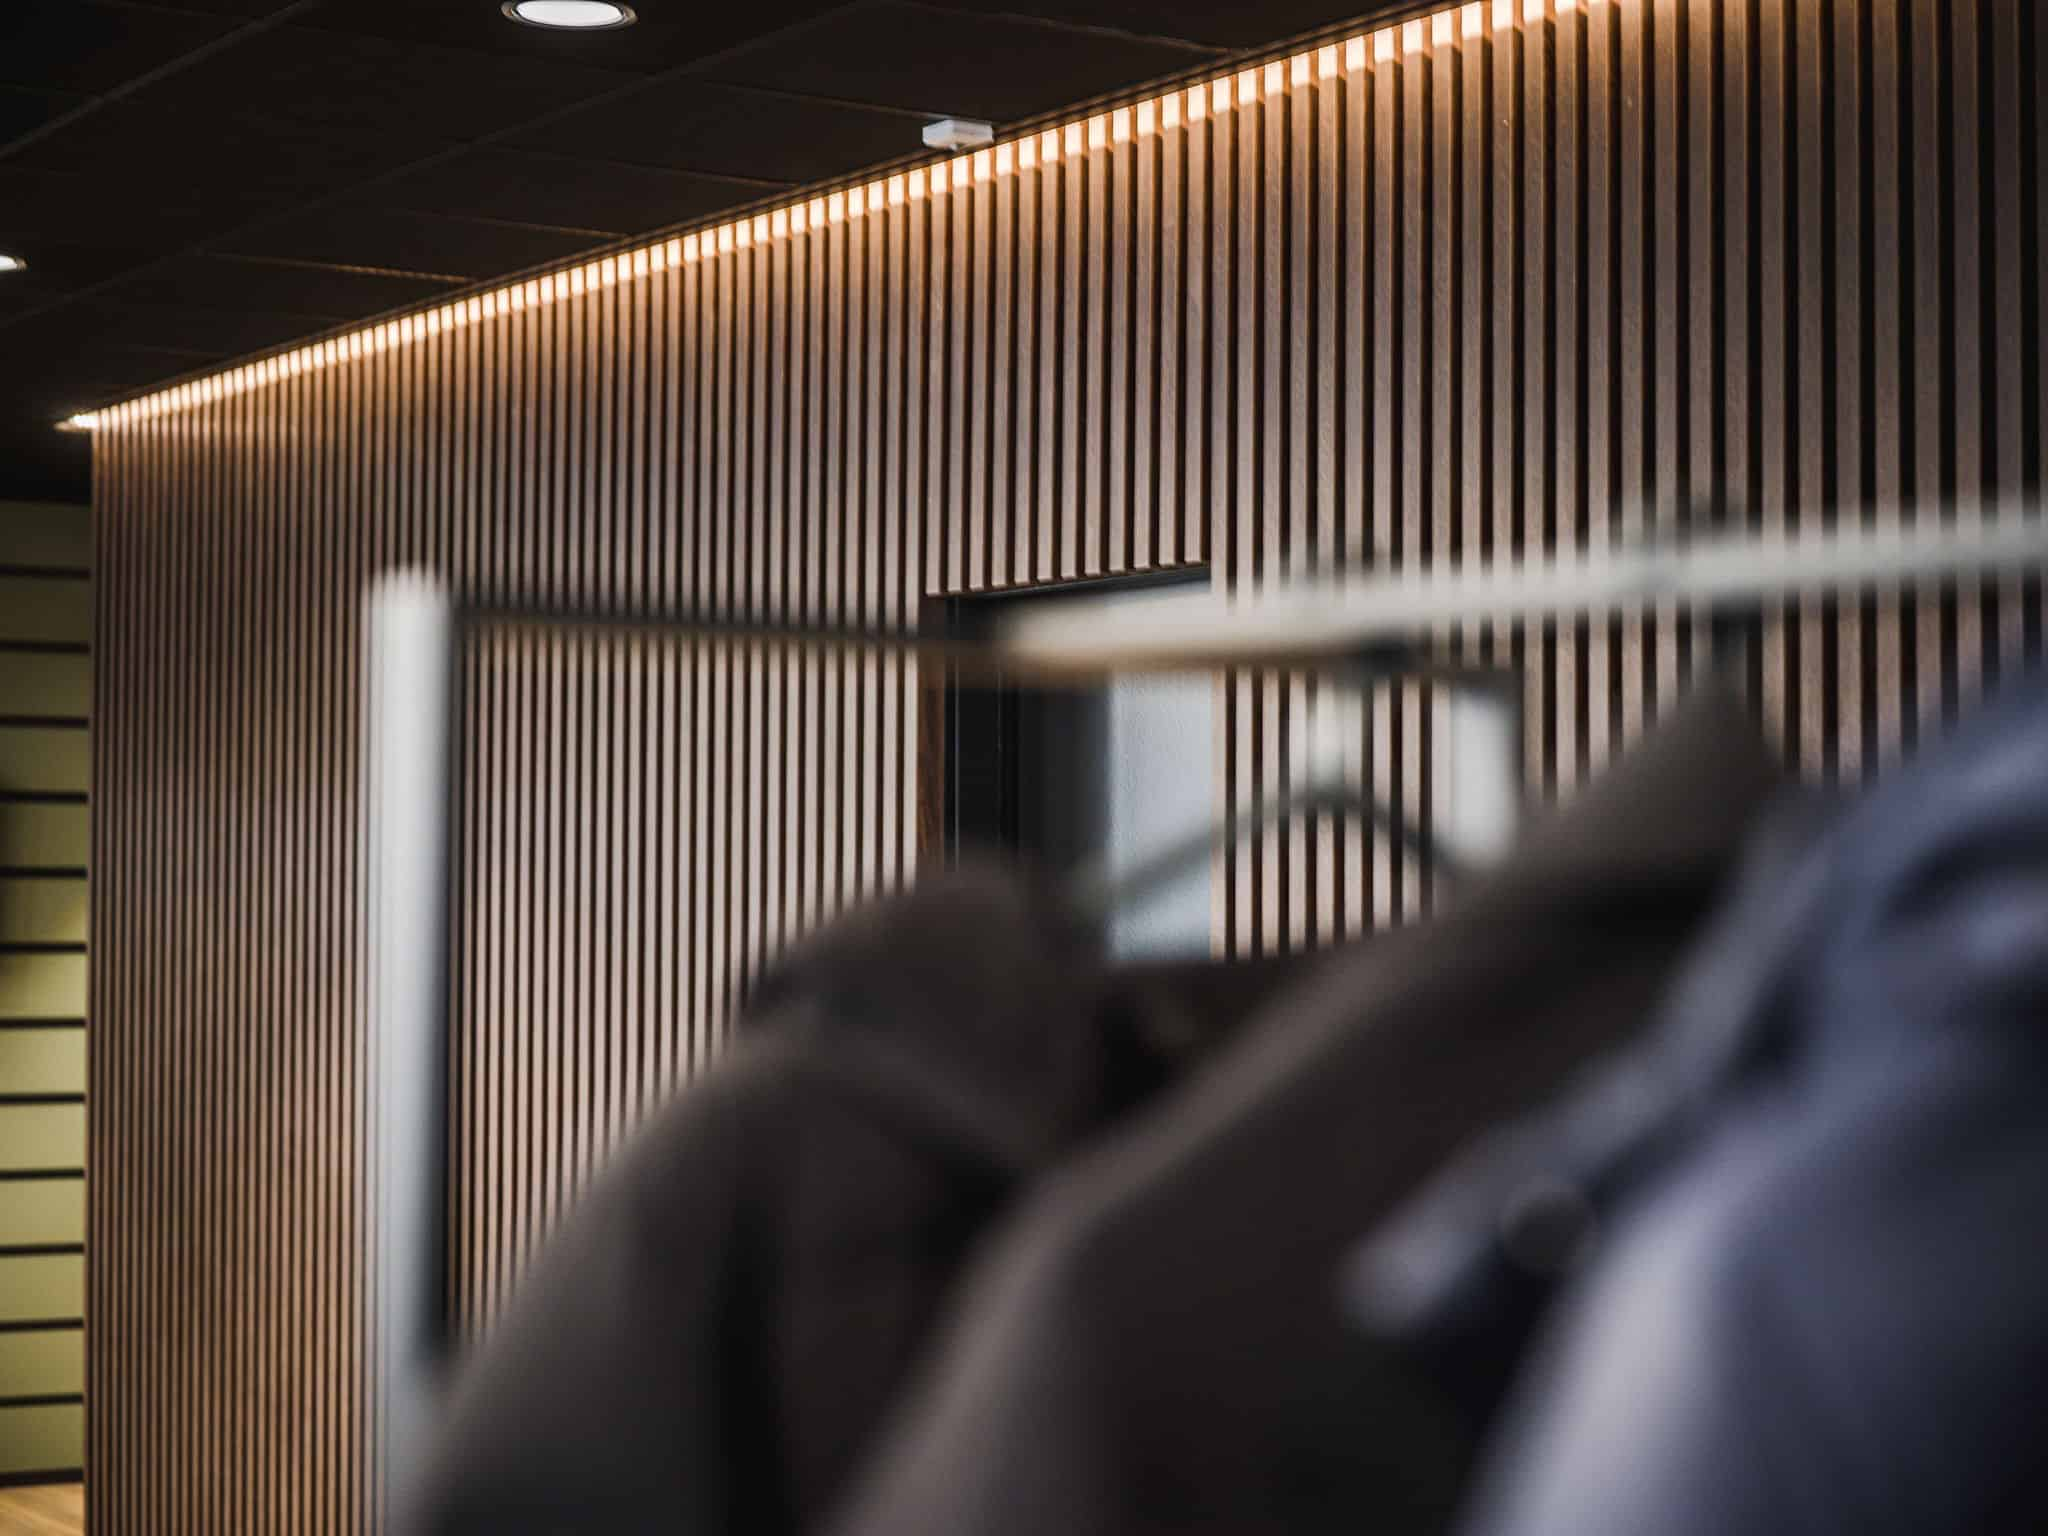 binnenhuisarchitect Wildenberg ontwerp COKZ wanddetail hout Fijri interieurbouw garderobe